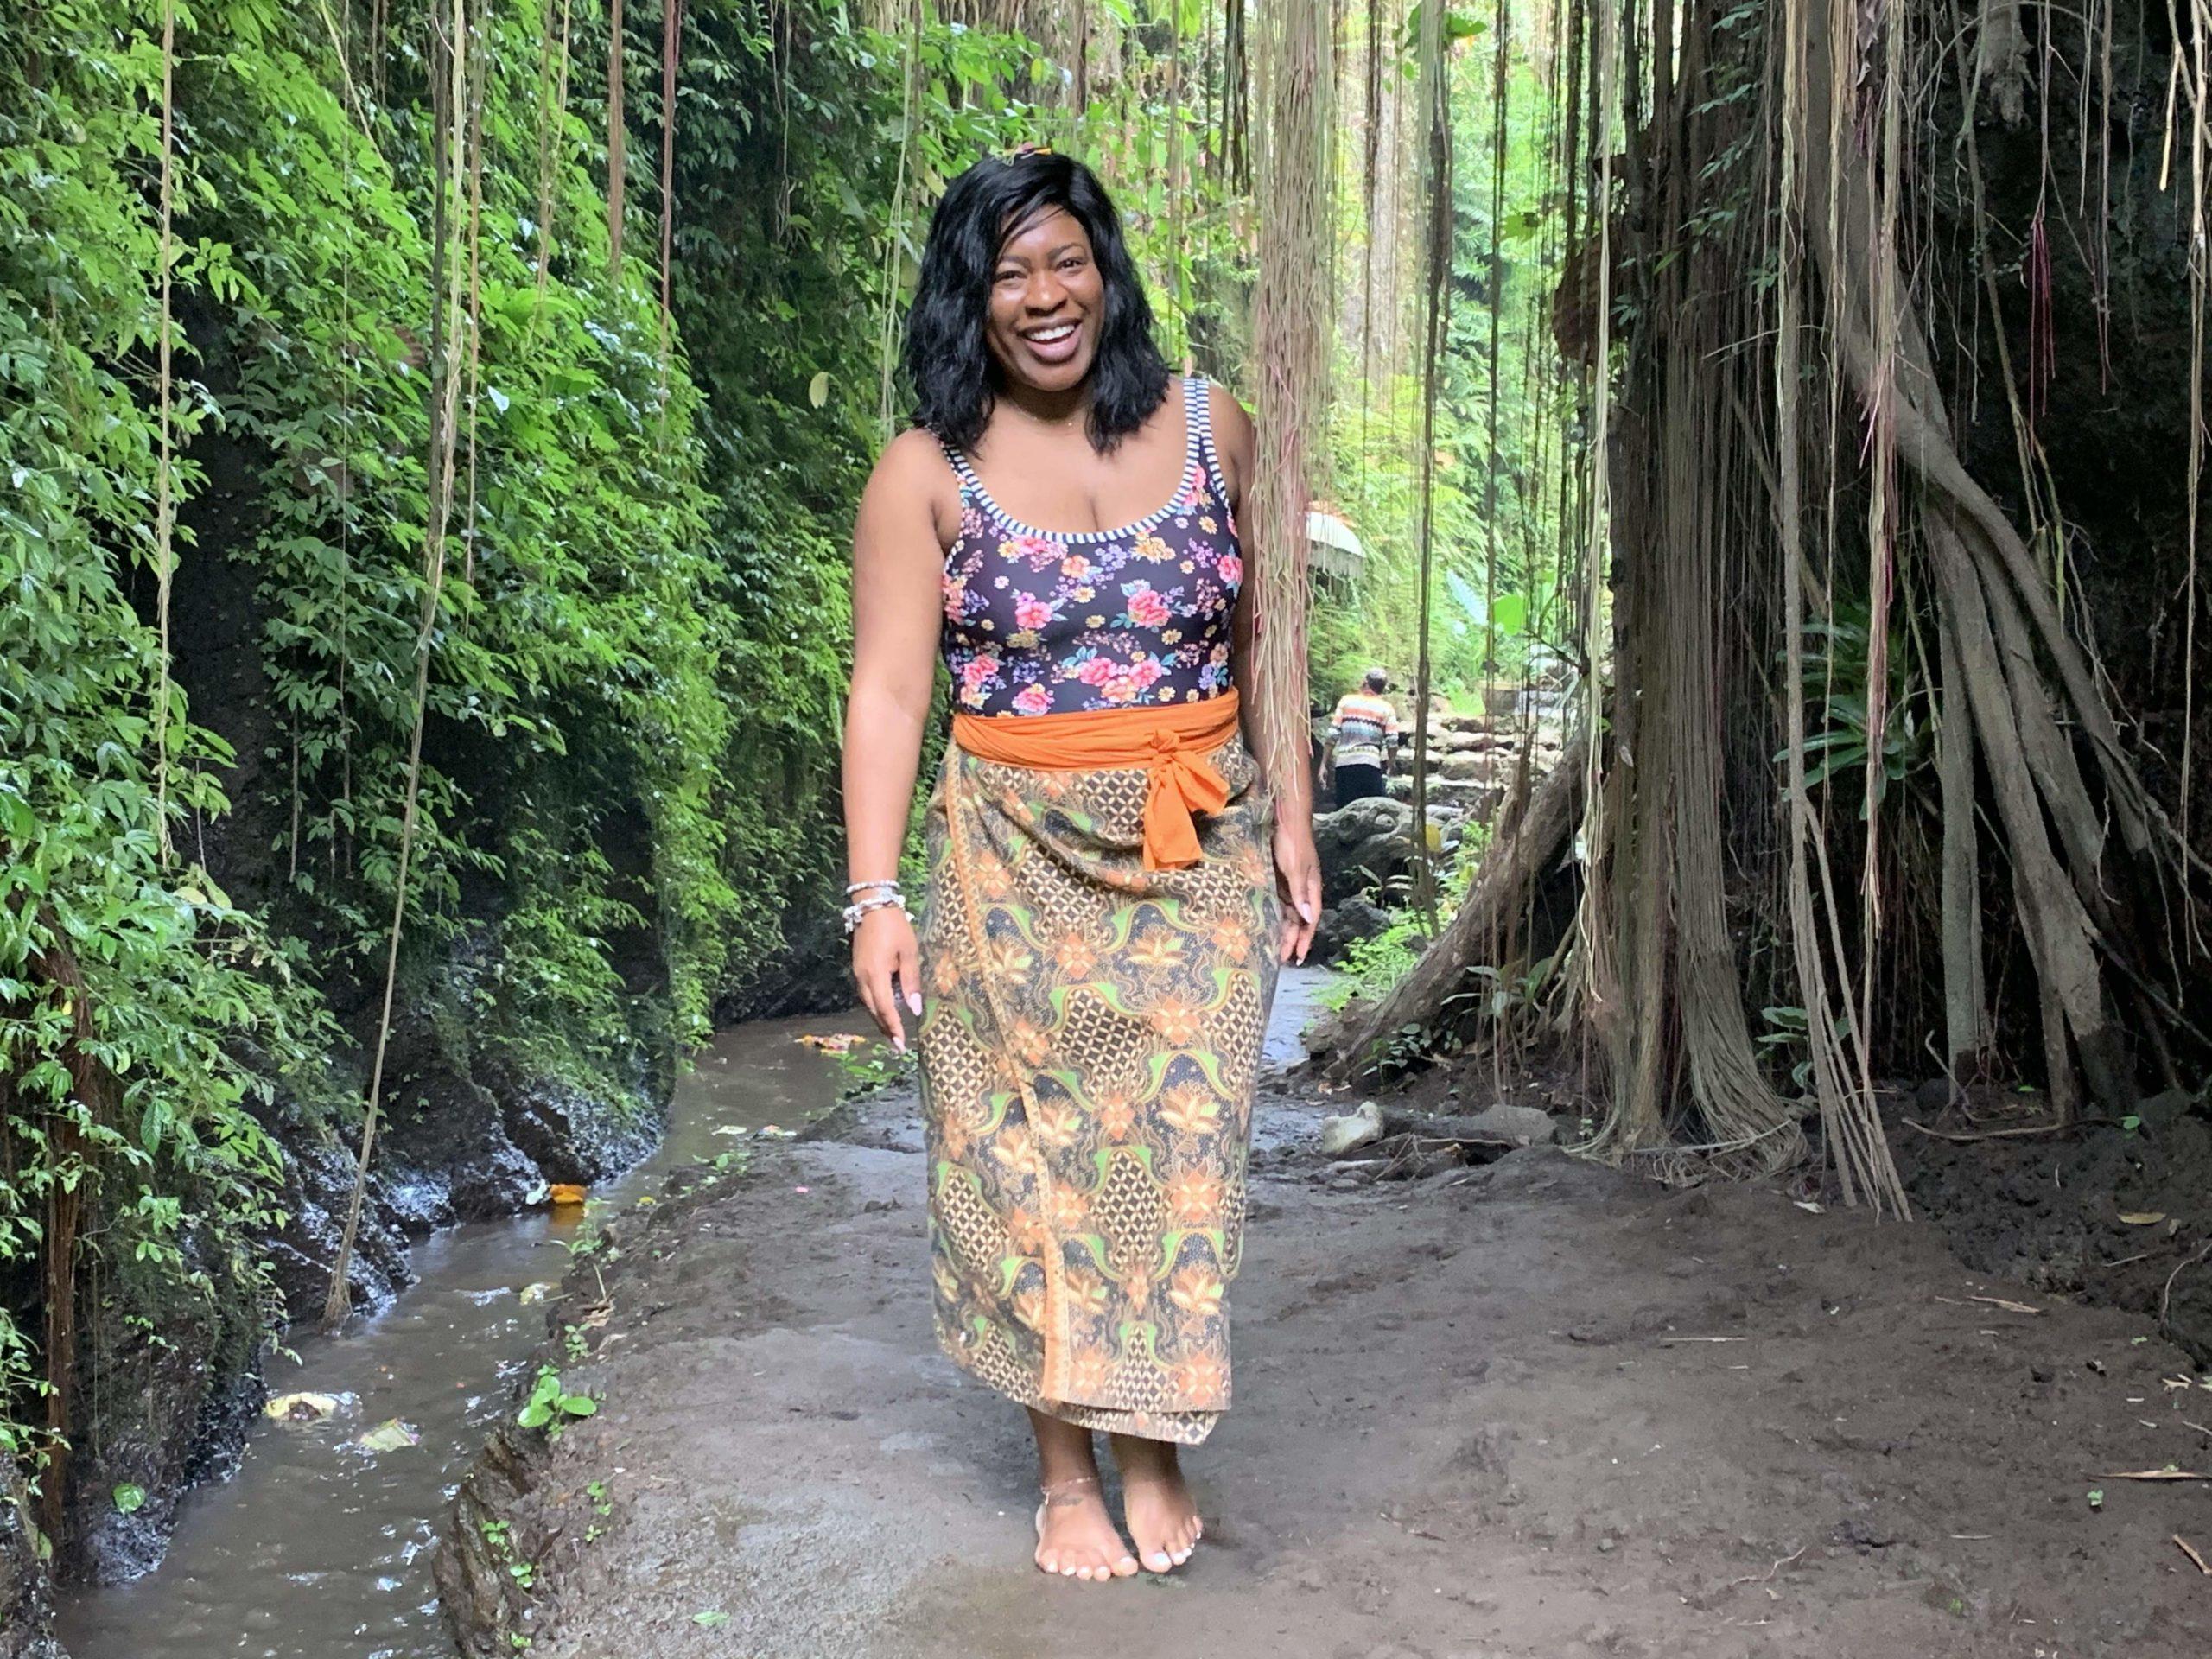 Bali Waterfall walk